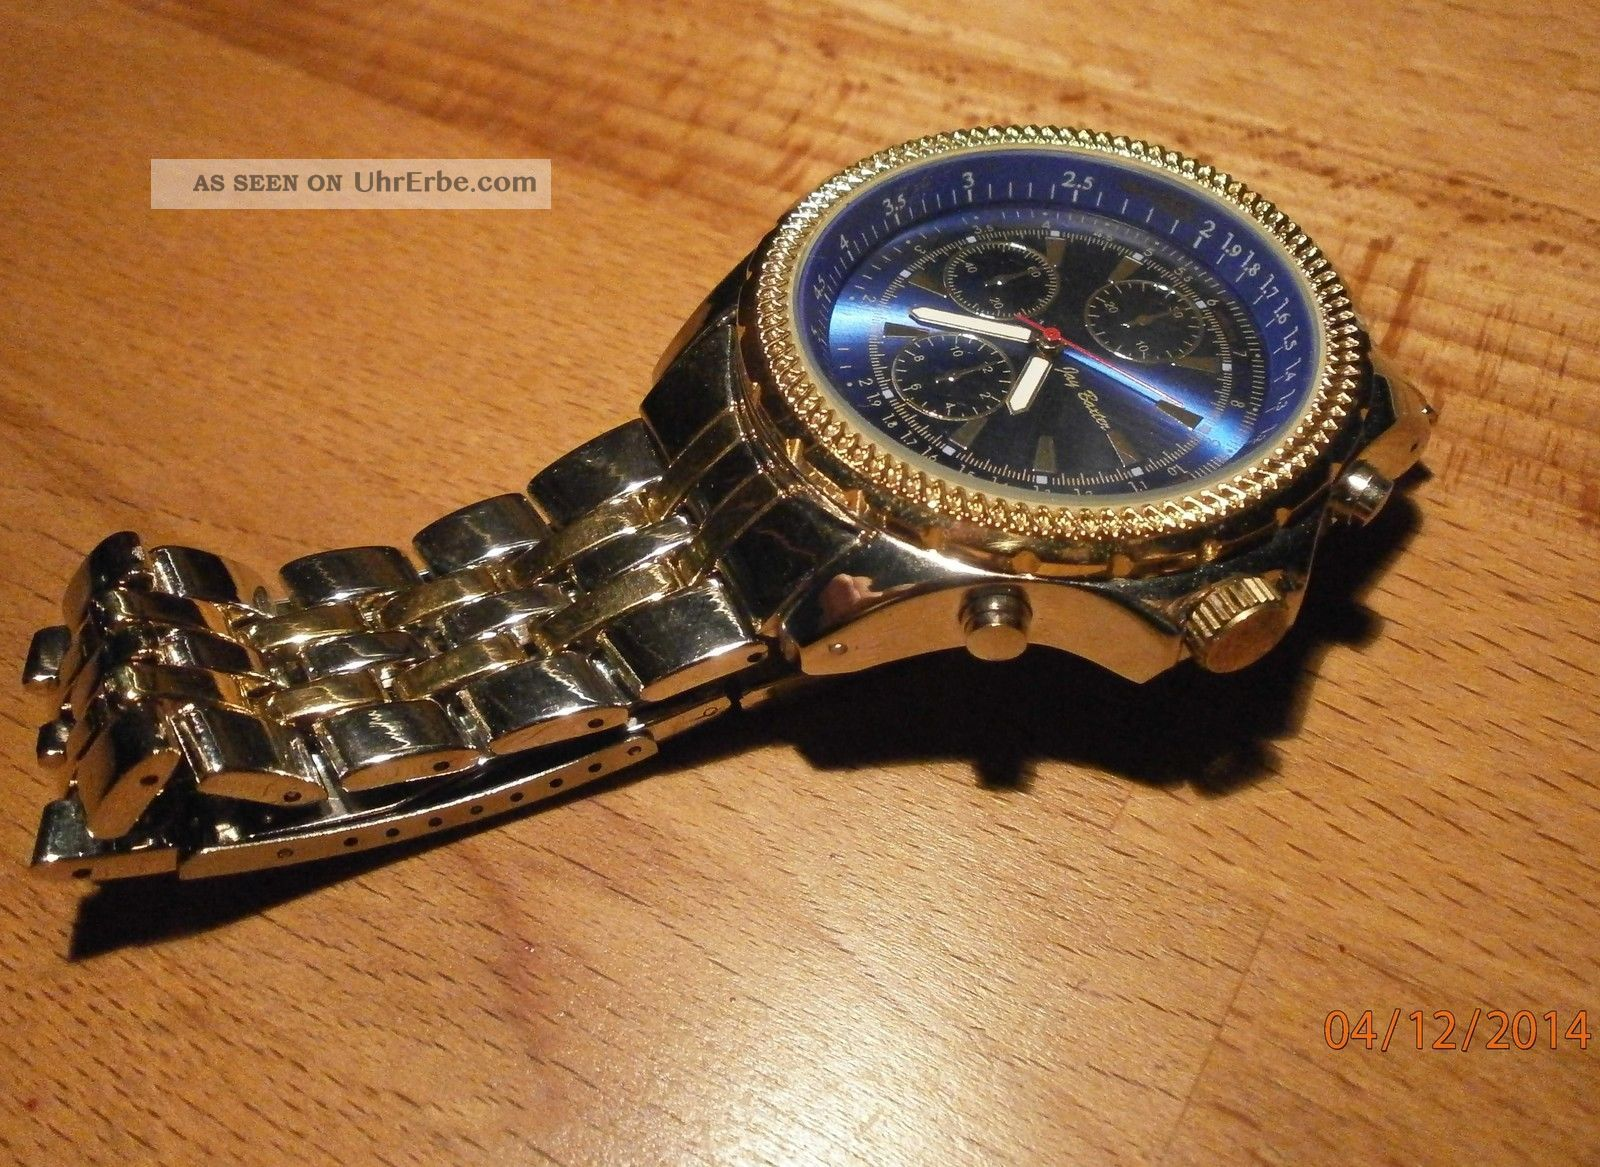 xxl jay baxter herrenuhr edelstahl armband metall silber. Black Bedroom Furniture Sets. Home Design Ideas